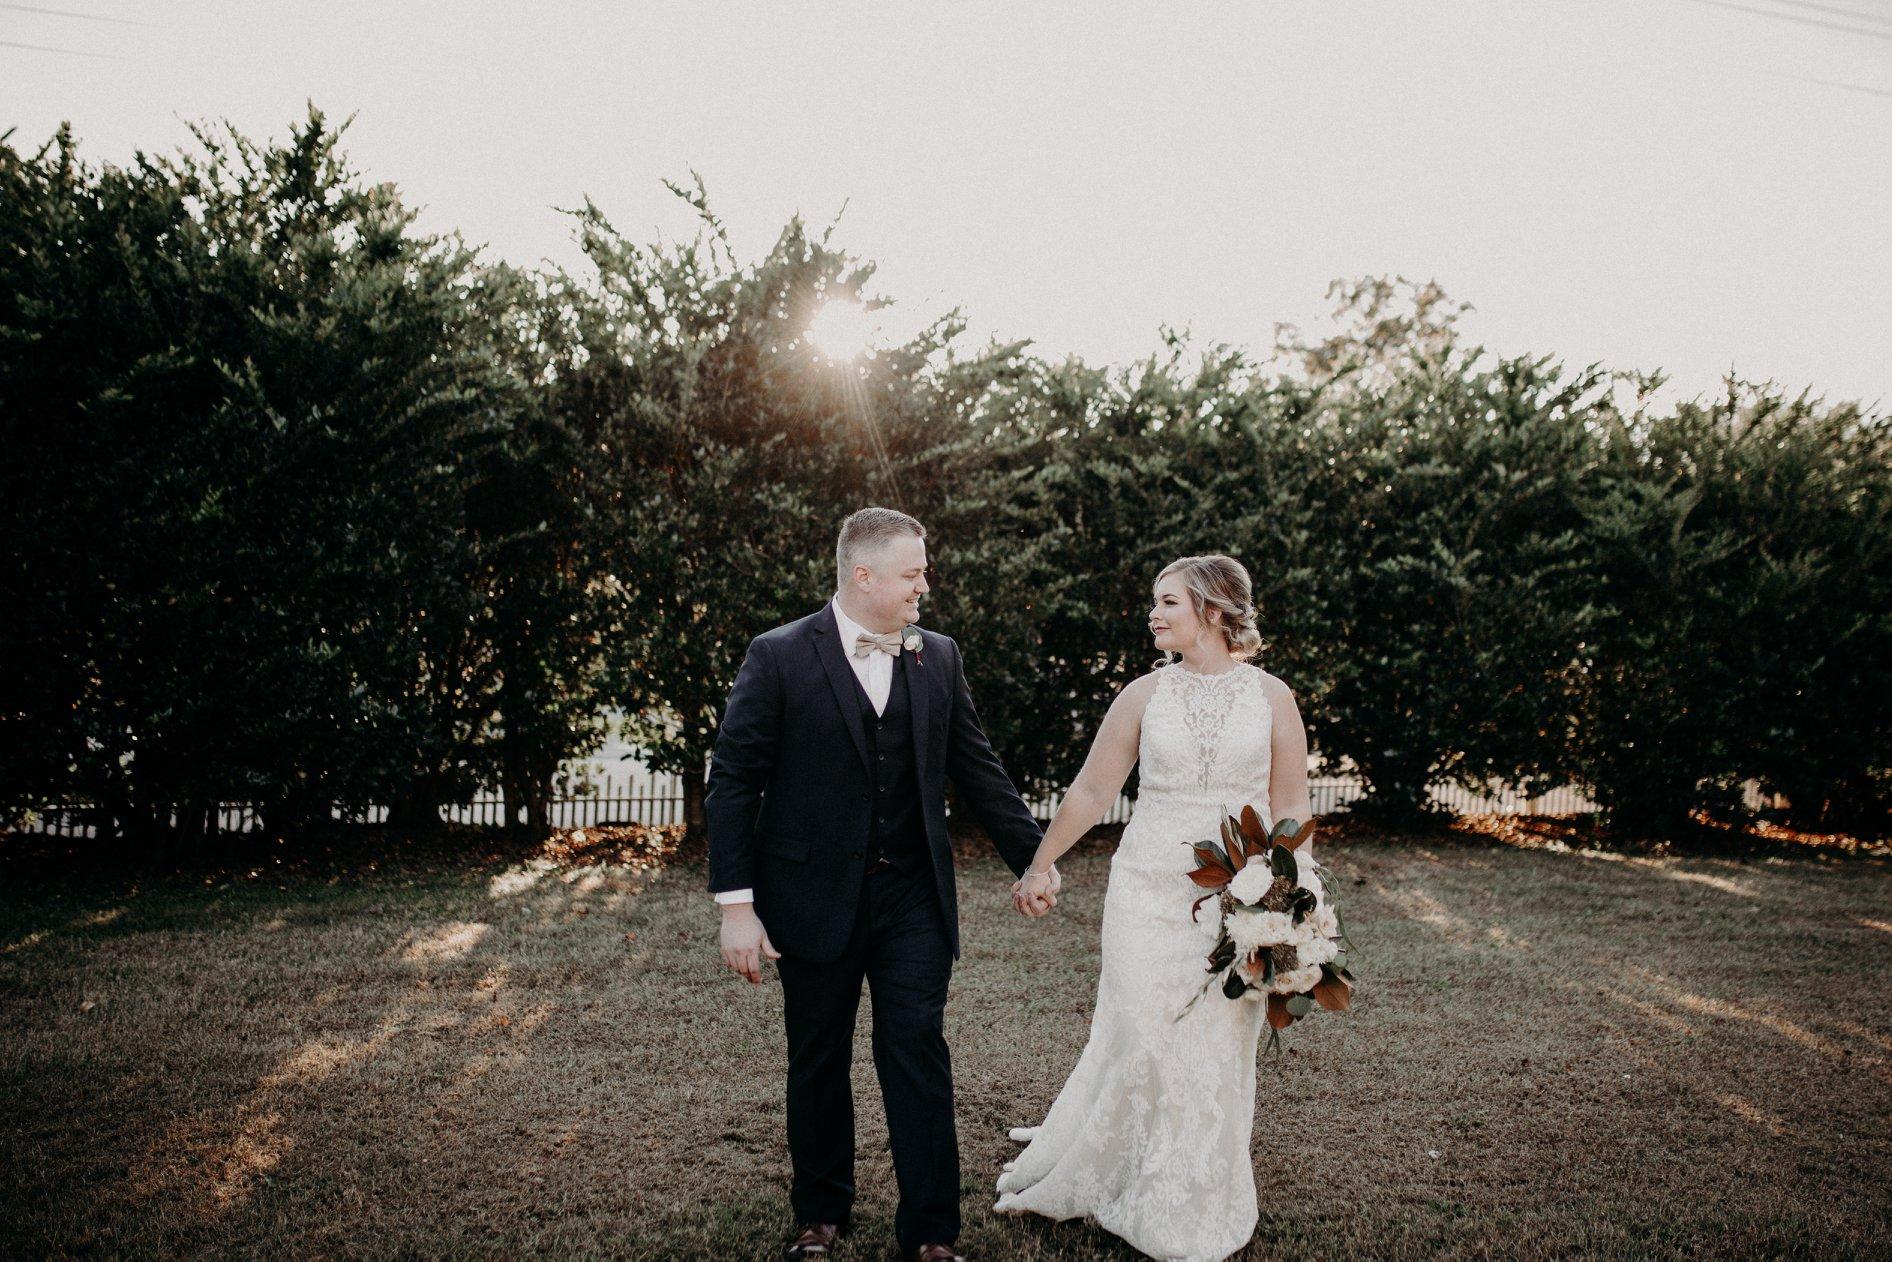 Bekah Leanne Photography LLC at William T Sutherlin Mansion (Danville, VA)